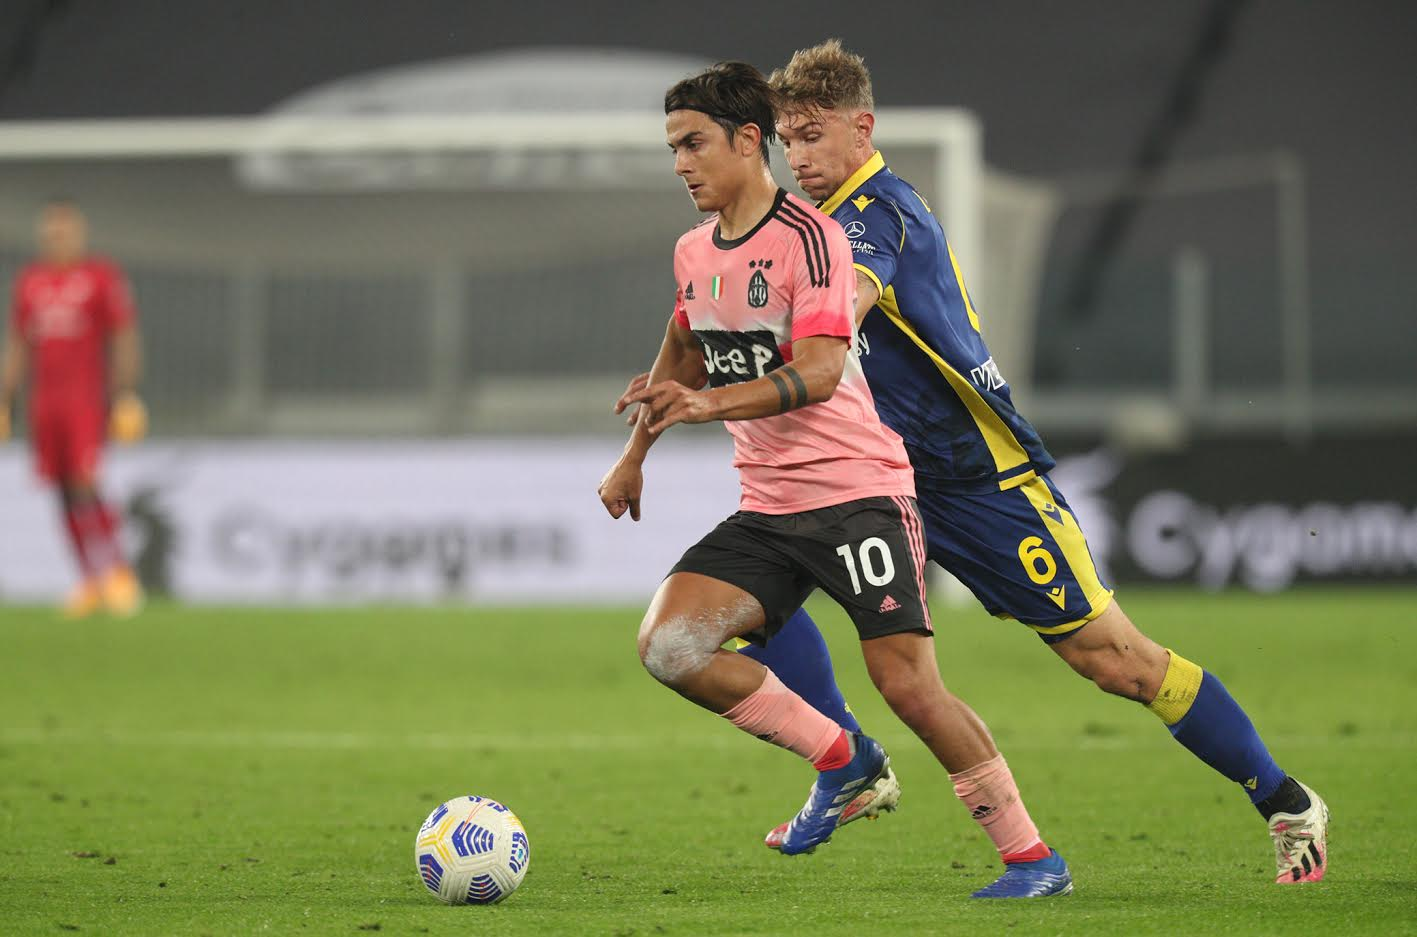 Juventus-Verona 1-1, le pagelle gialloblù di CH - Calcio Hellas